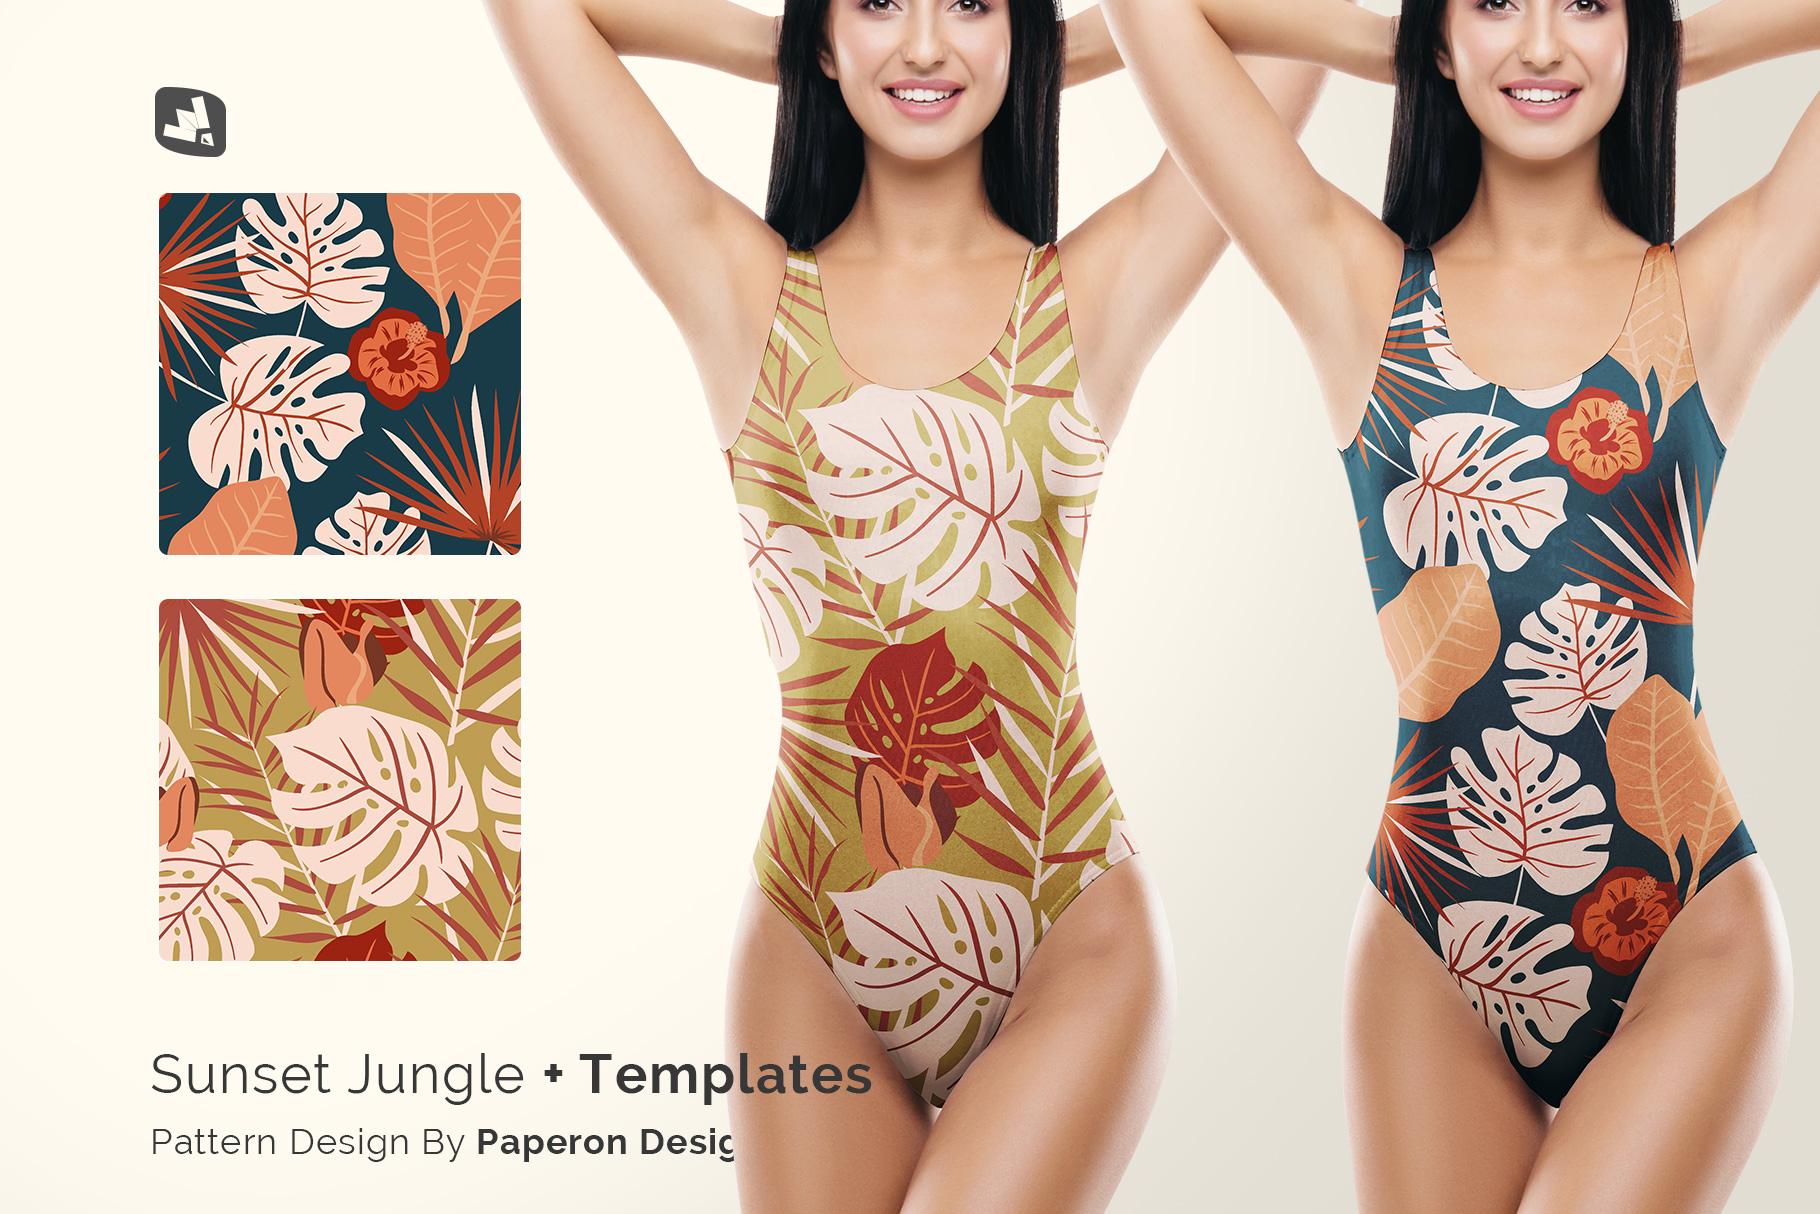 designer's credit of the women's swimsuit mockup